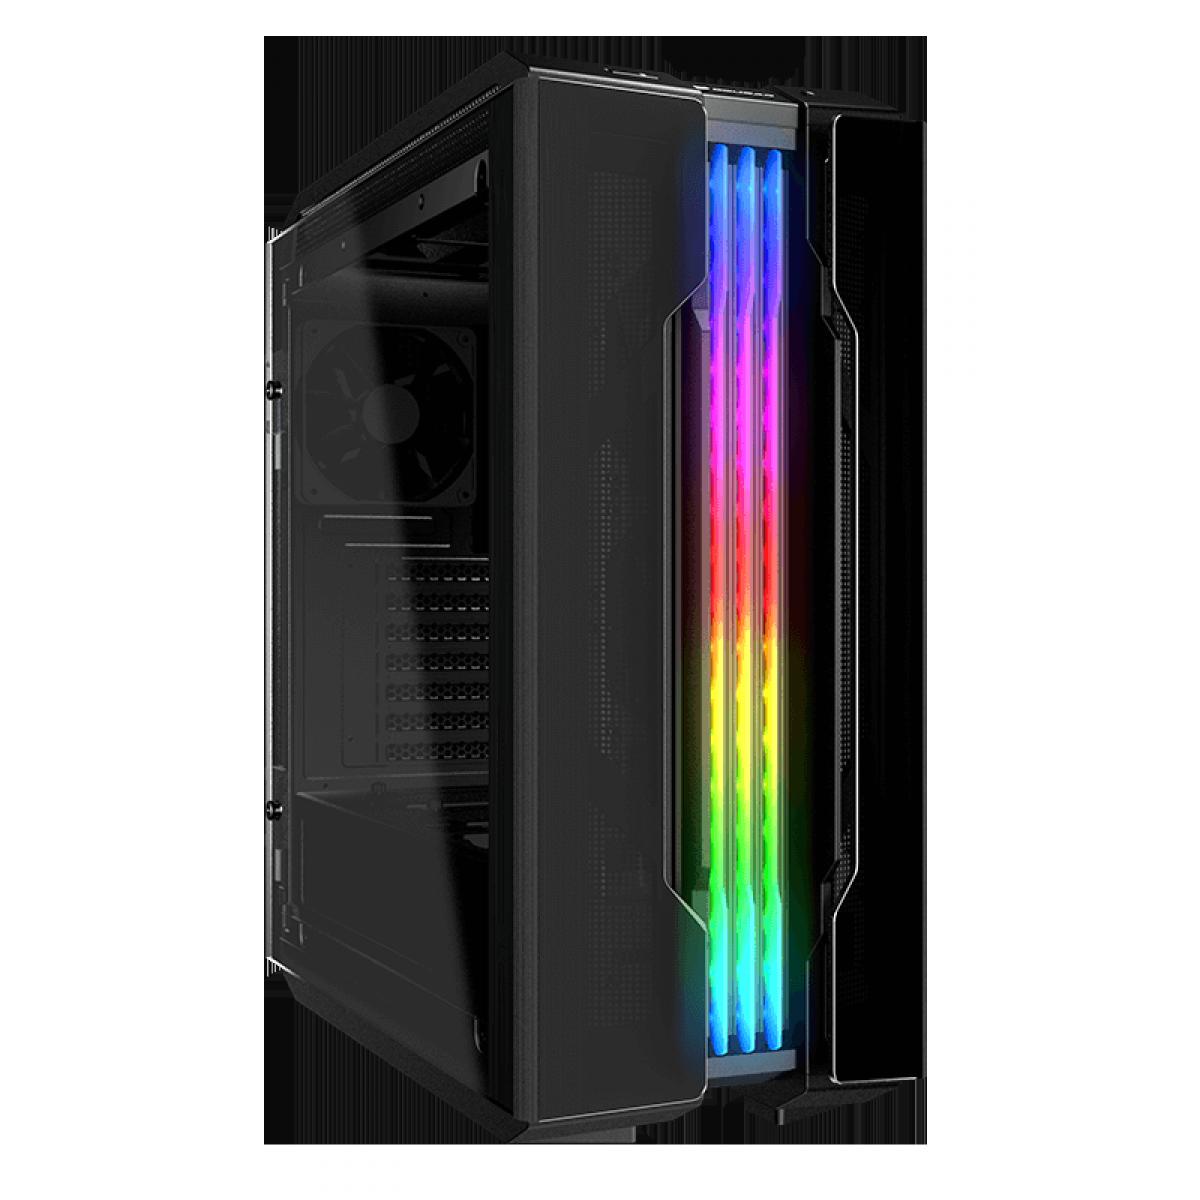 Gabinete Gamer Cougar Gemini T Pro, Mid Tower, Vidro Temperado, ARGB, Black, Com 1 Fan, Sem Fonte, 106KMT0008-00